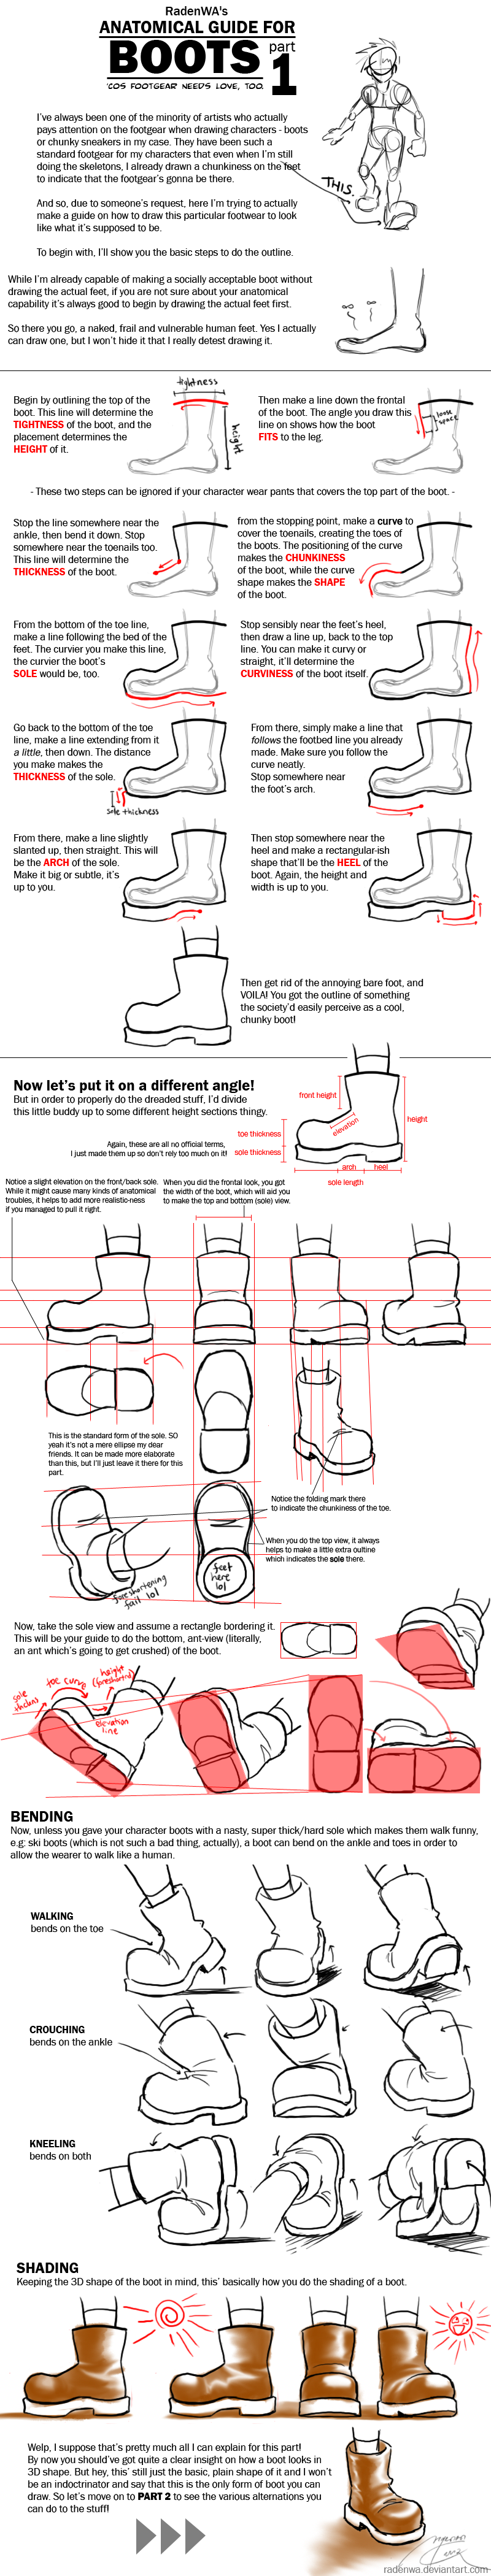 WA's BOOT Anatomy Tutorial Pt1 by RadenWA